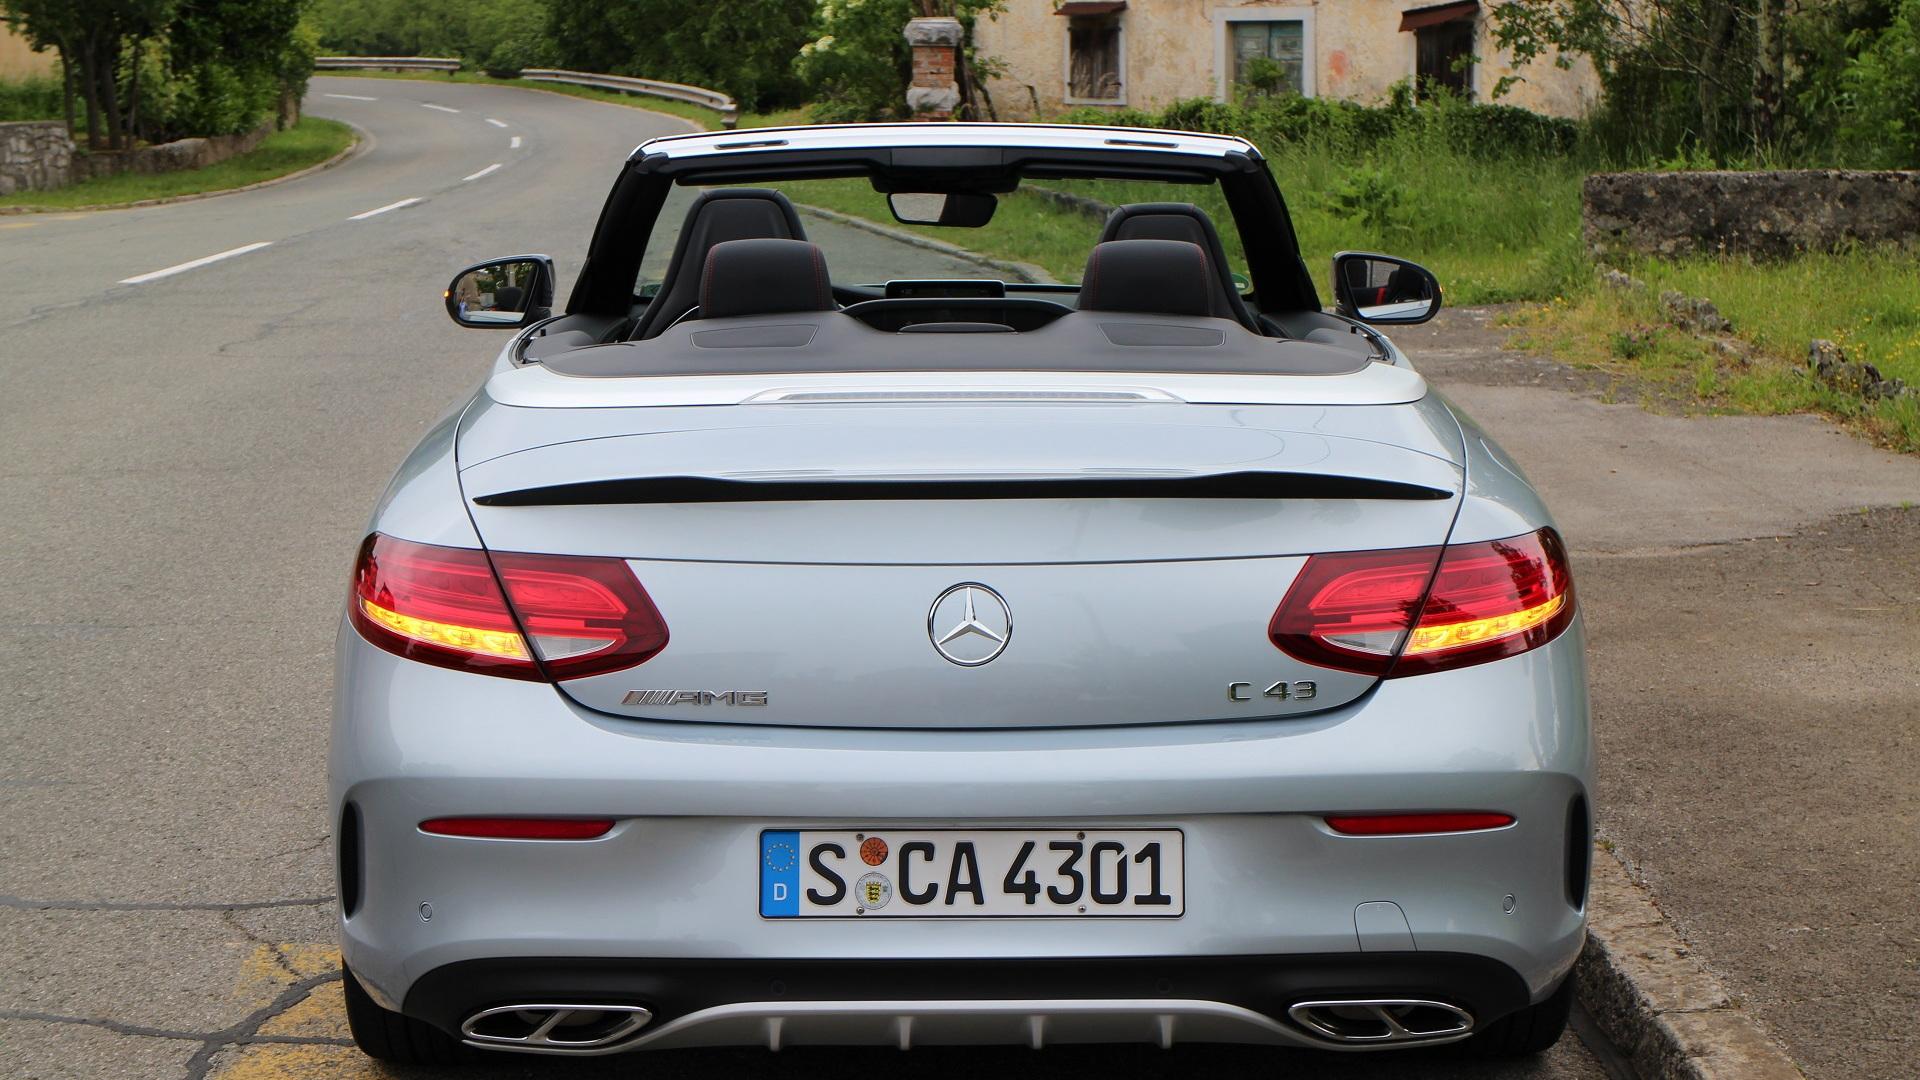 2017 Mercedes-AMG C43 Cabrio (European version), Trieste region, May 2016